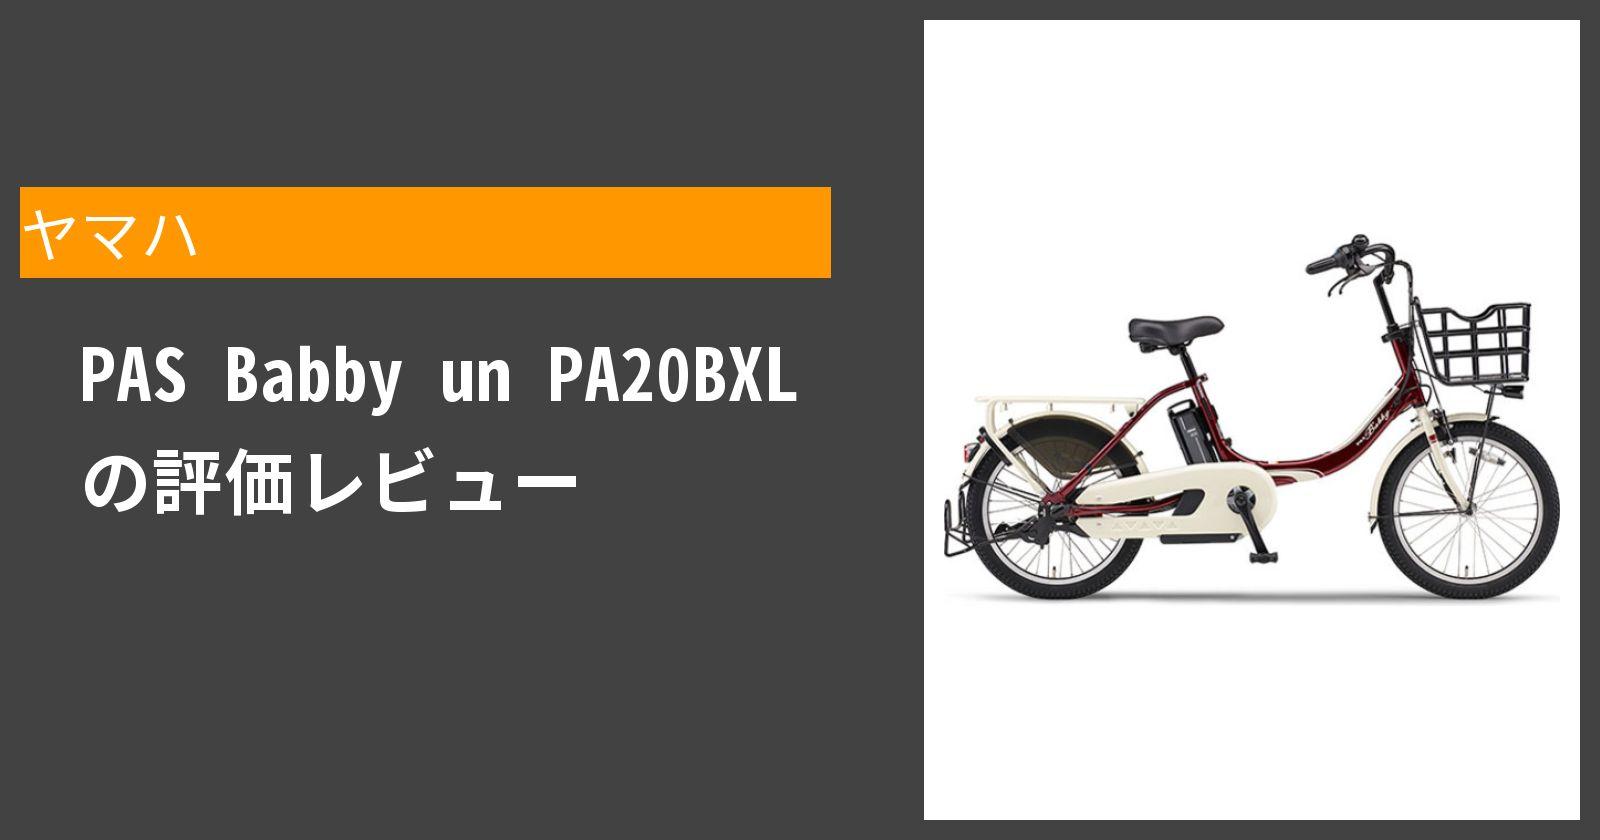 PAS Babby un PA20BXLを徹底評価